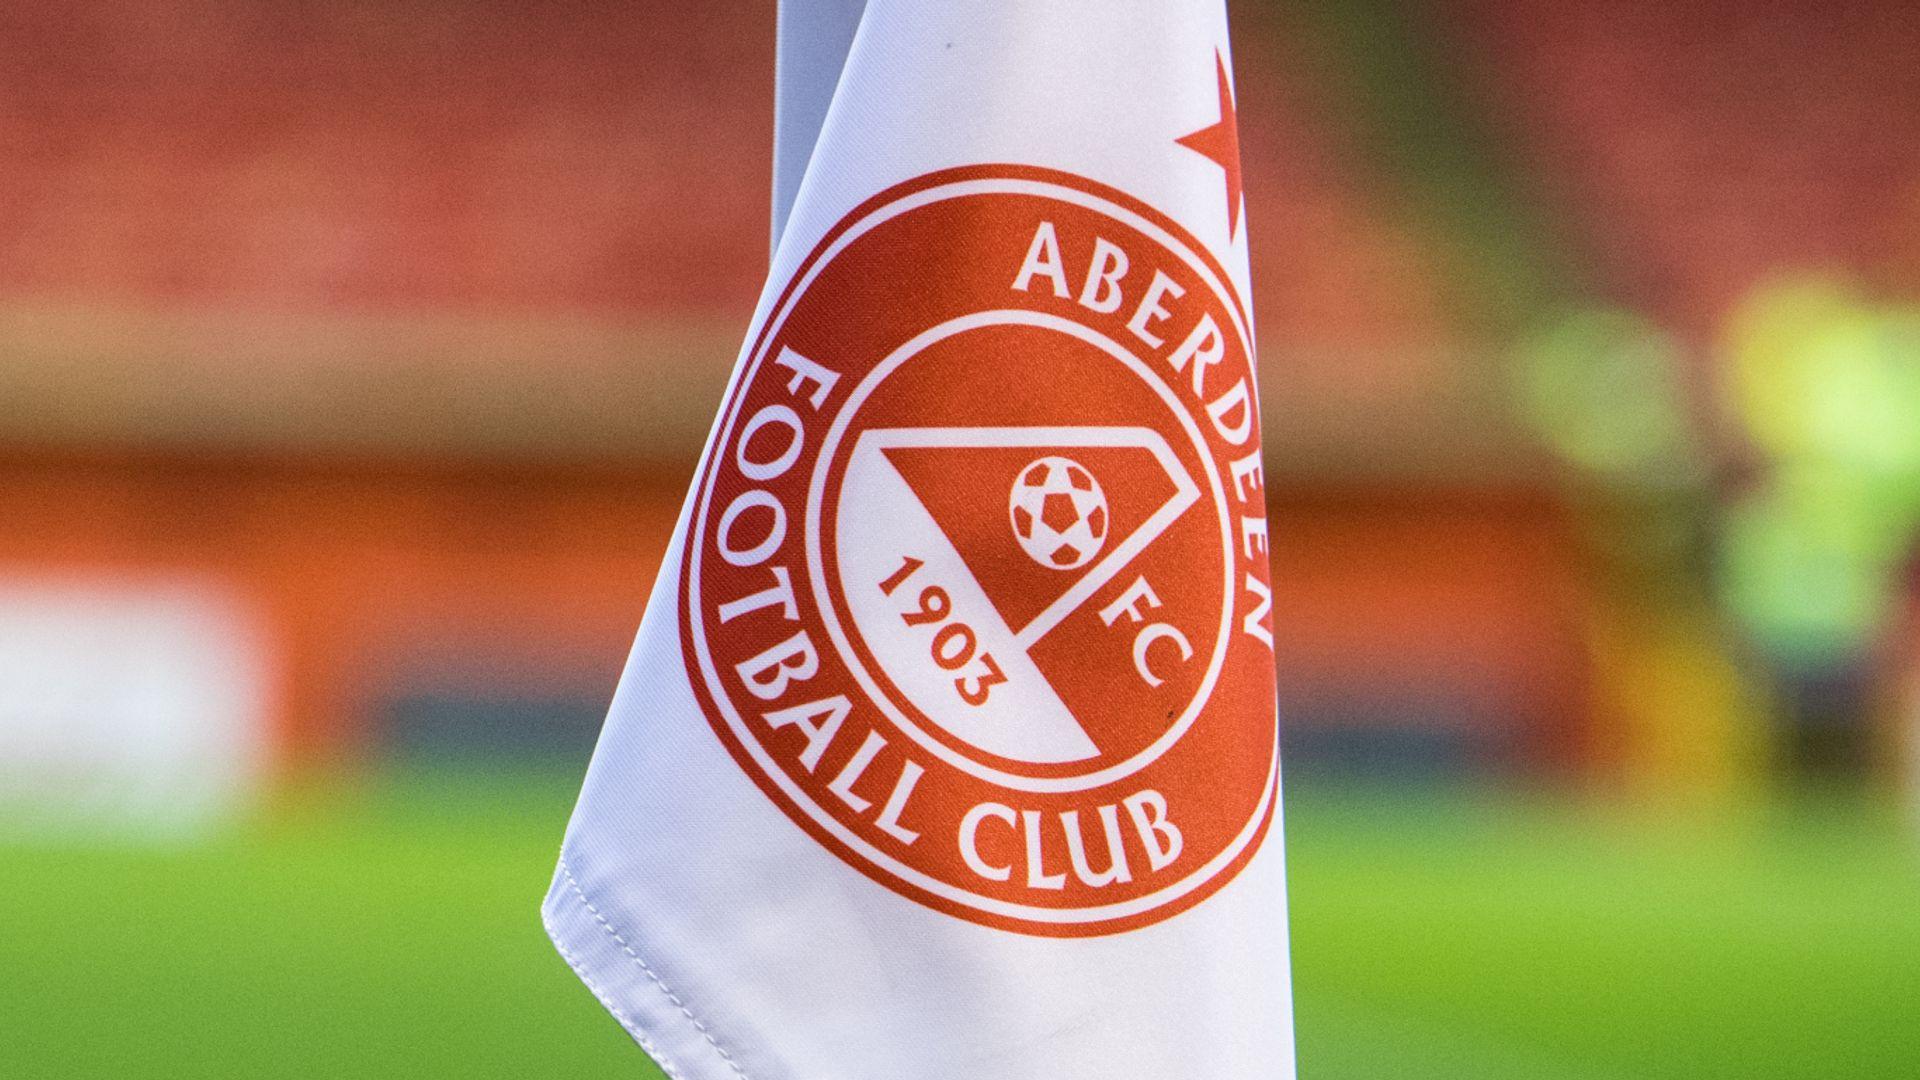 SPFL expects Aberdeen vs Hamilton to go ahead